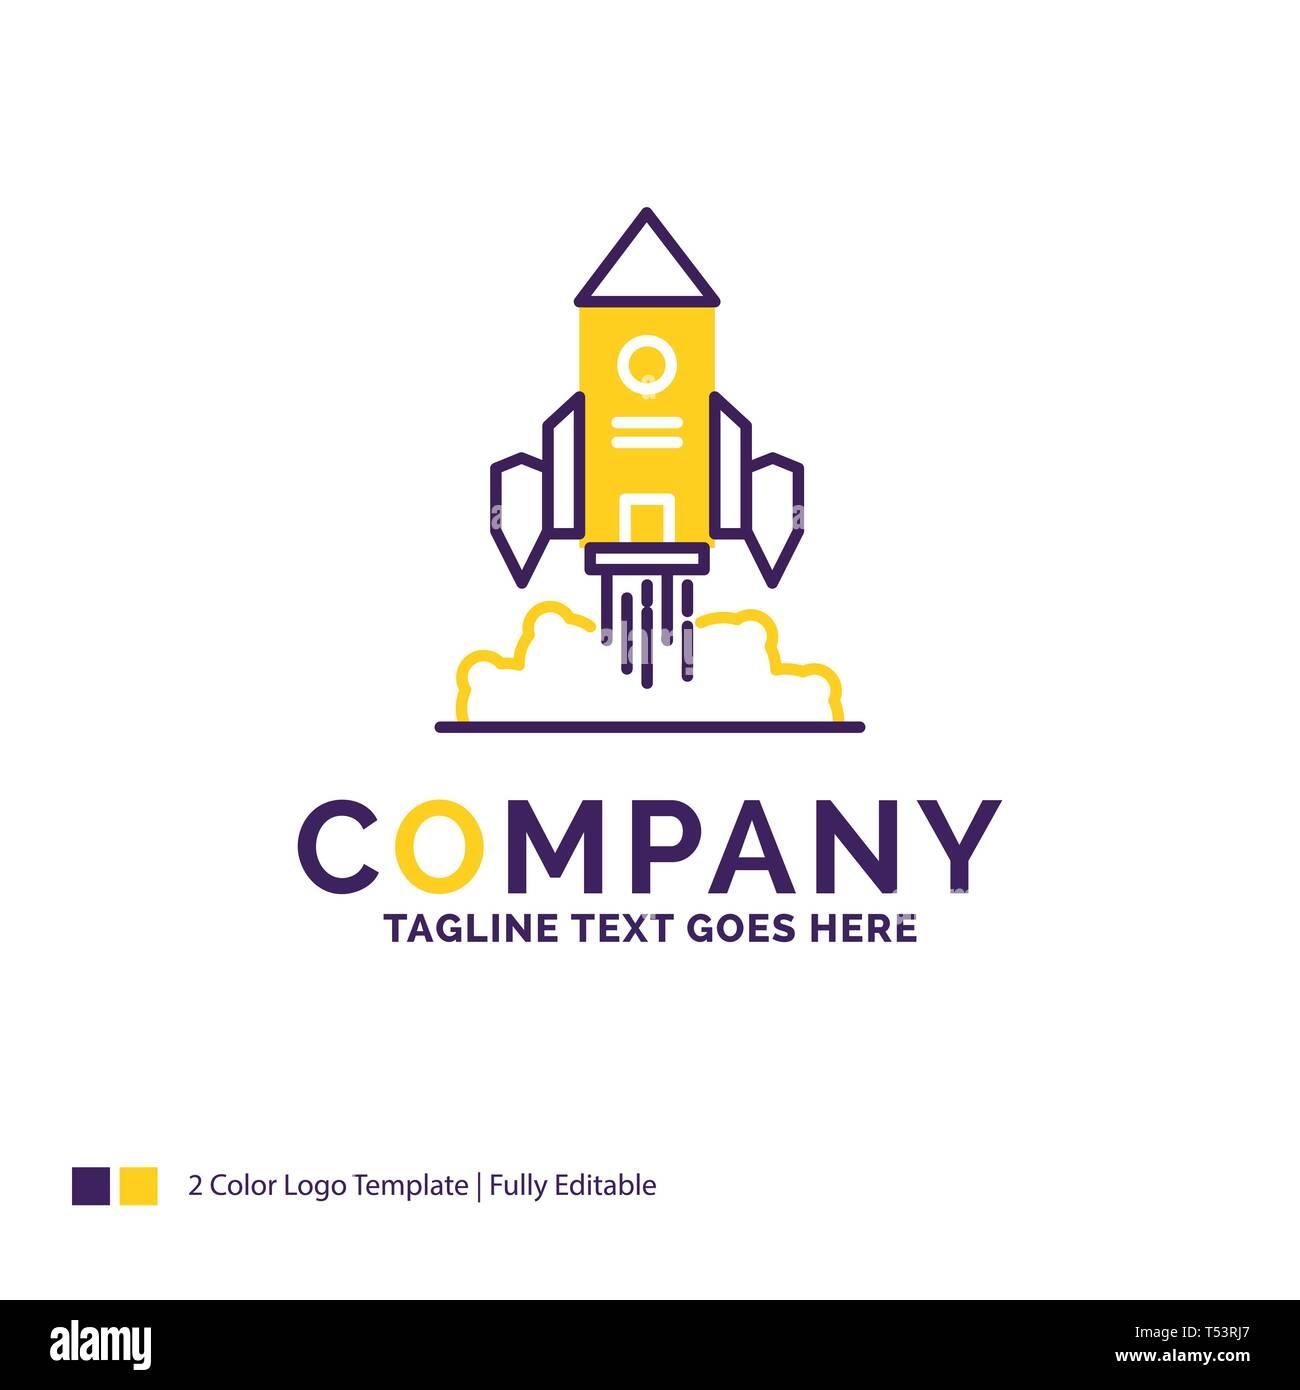 Company Name Logo Design For Rocket, spaceship, startup